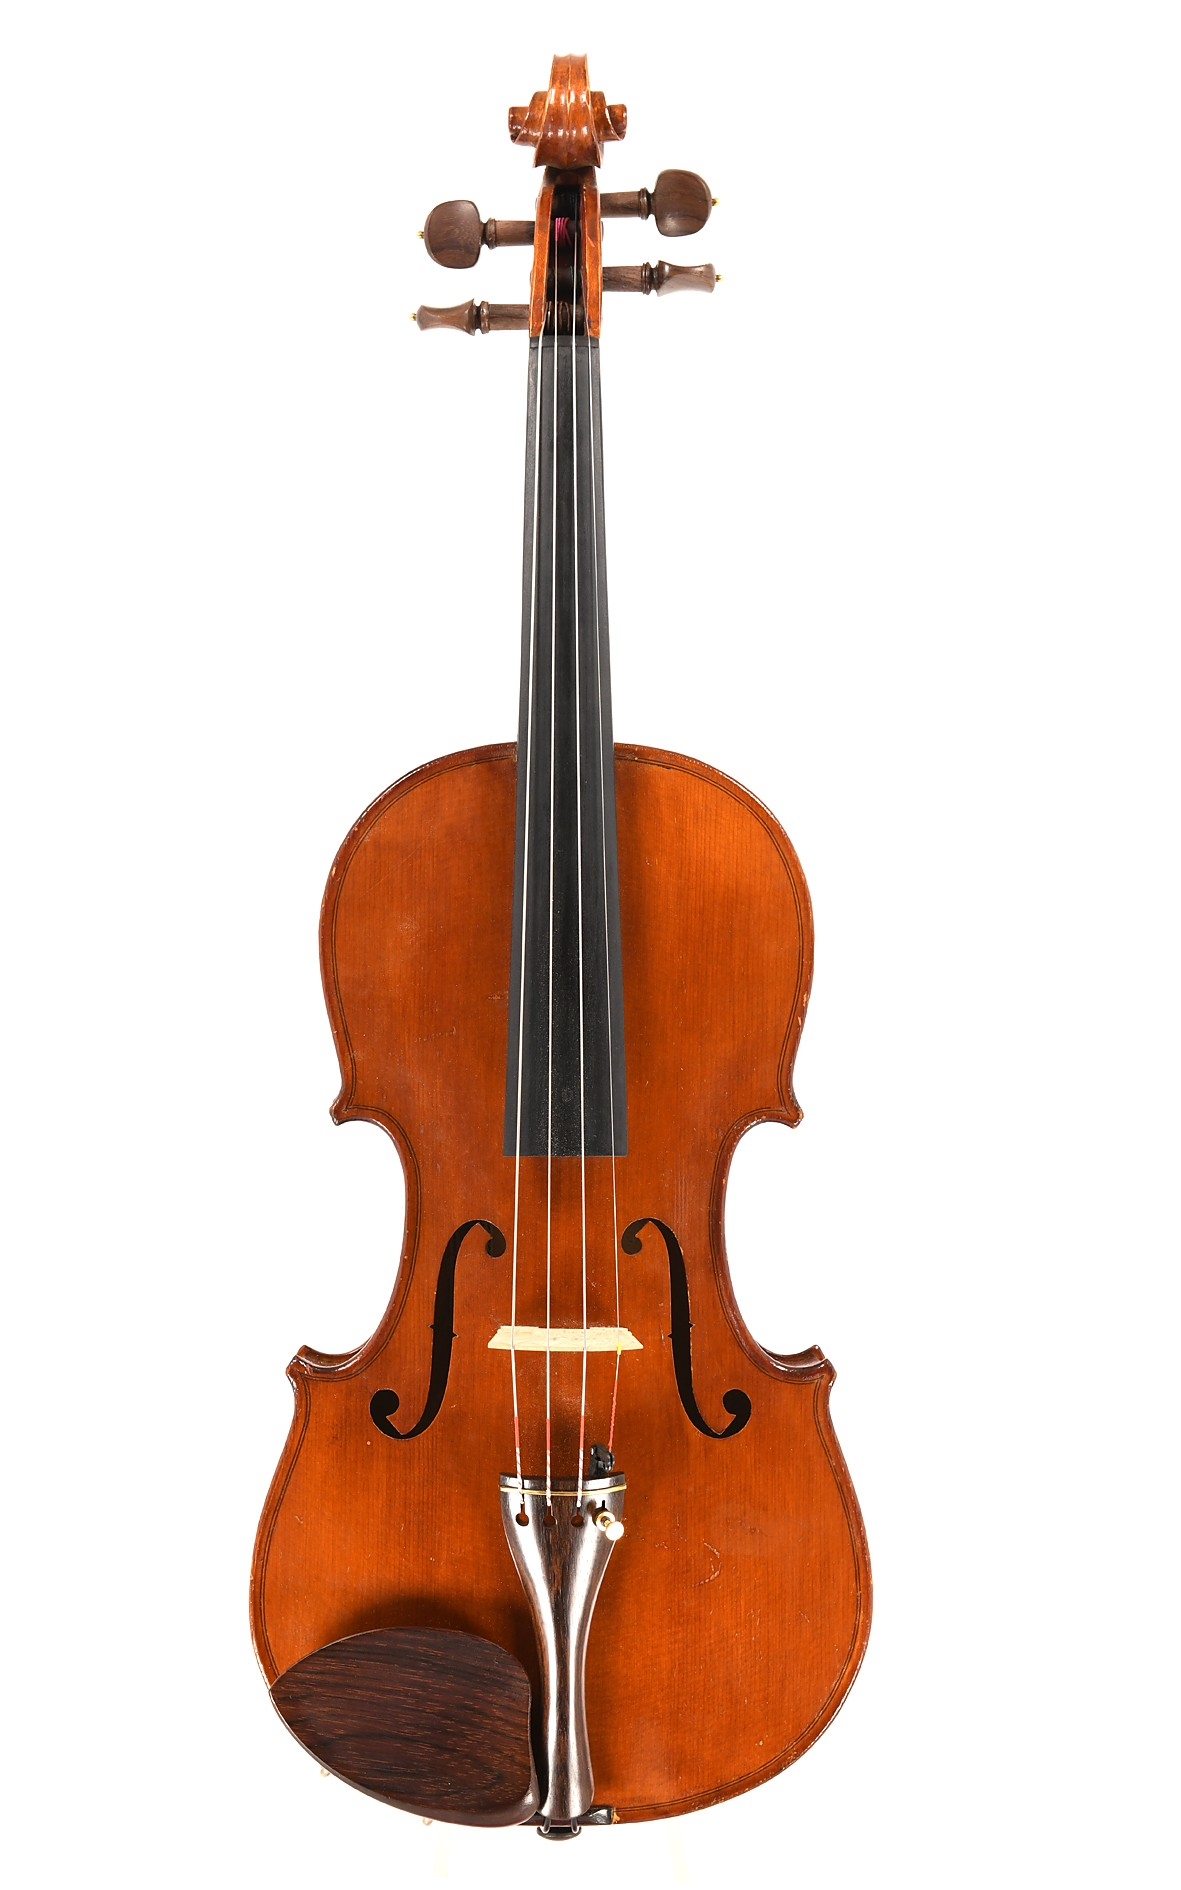 Violine, Robert Barth um 1920 - Decke